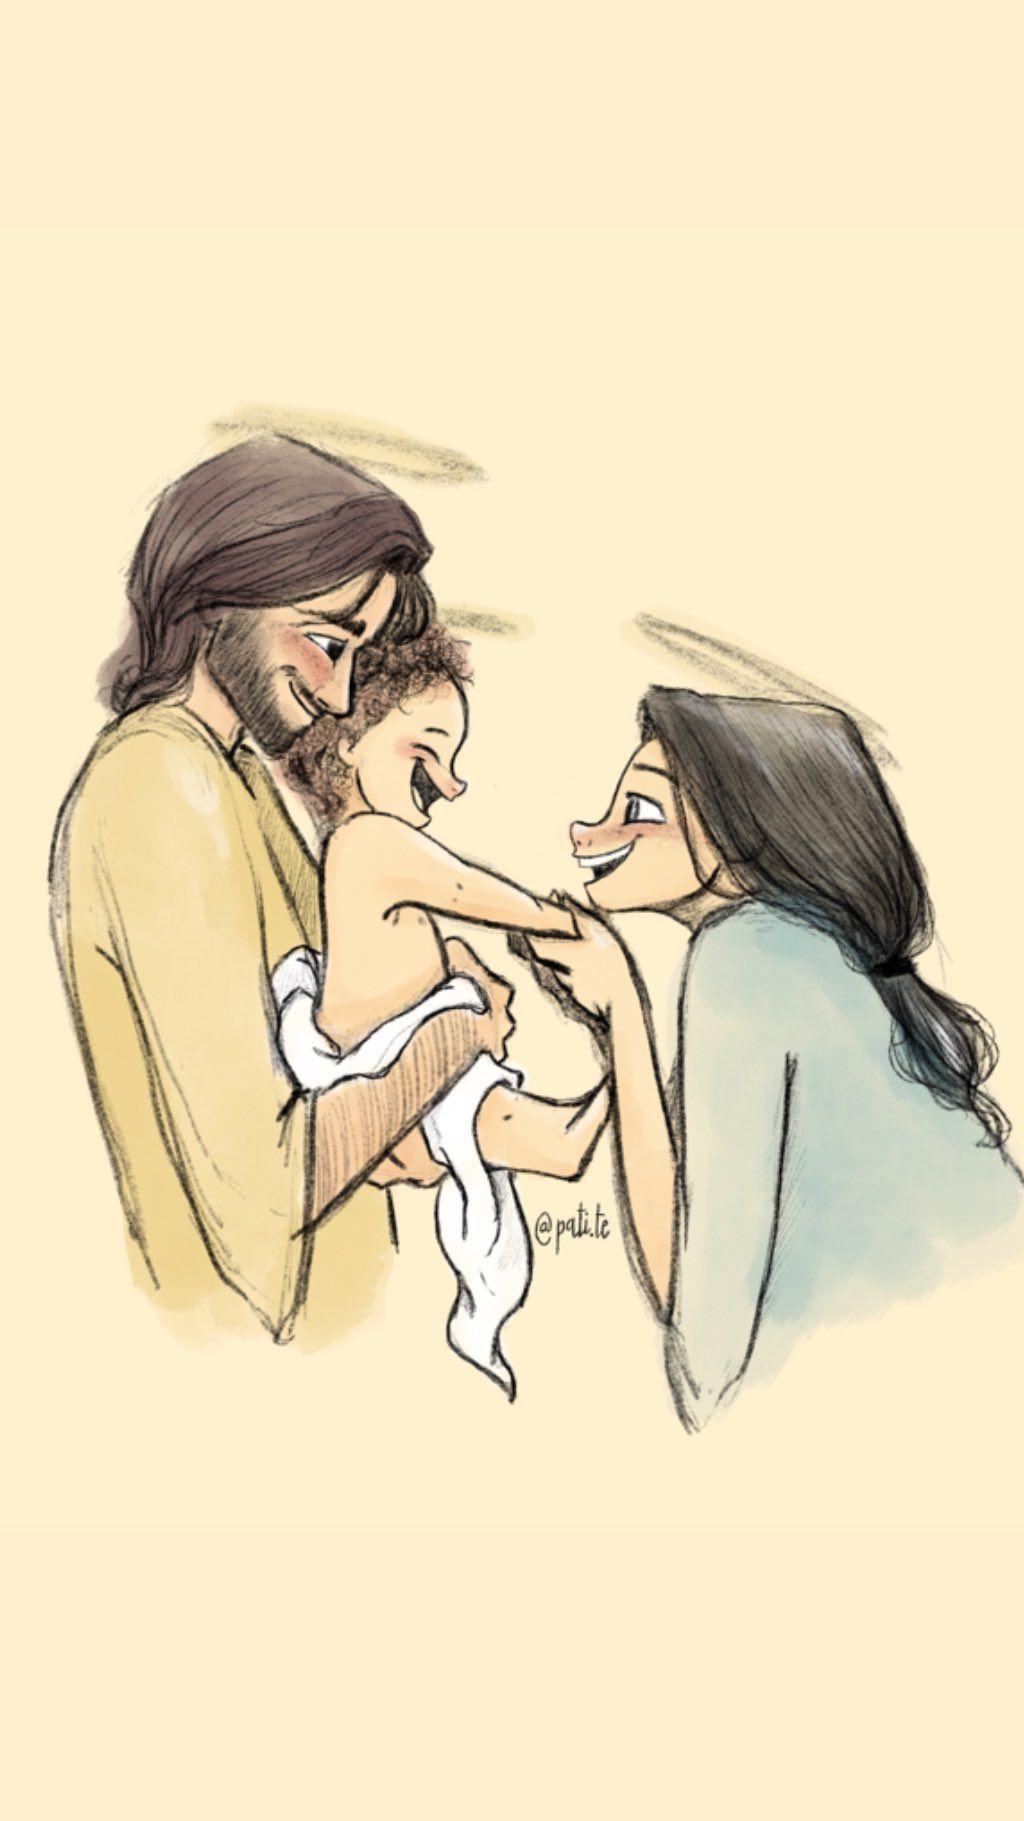 FONDOS - @pati.te in 8  Jesus cartoon, Pictures of jesus